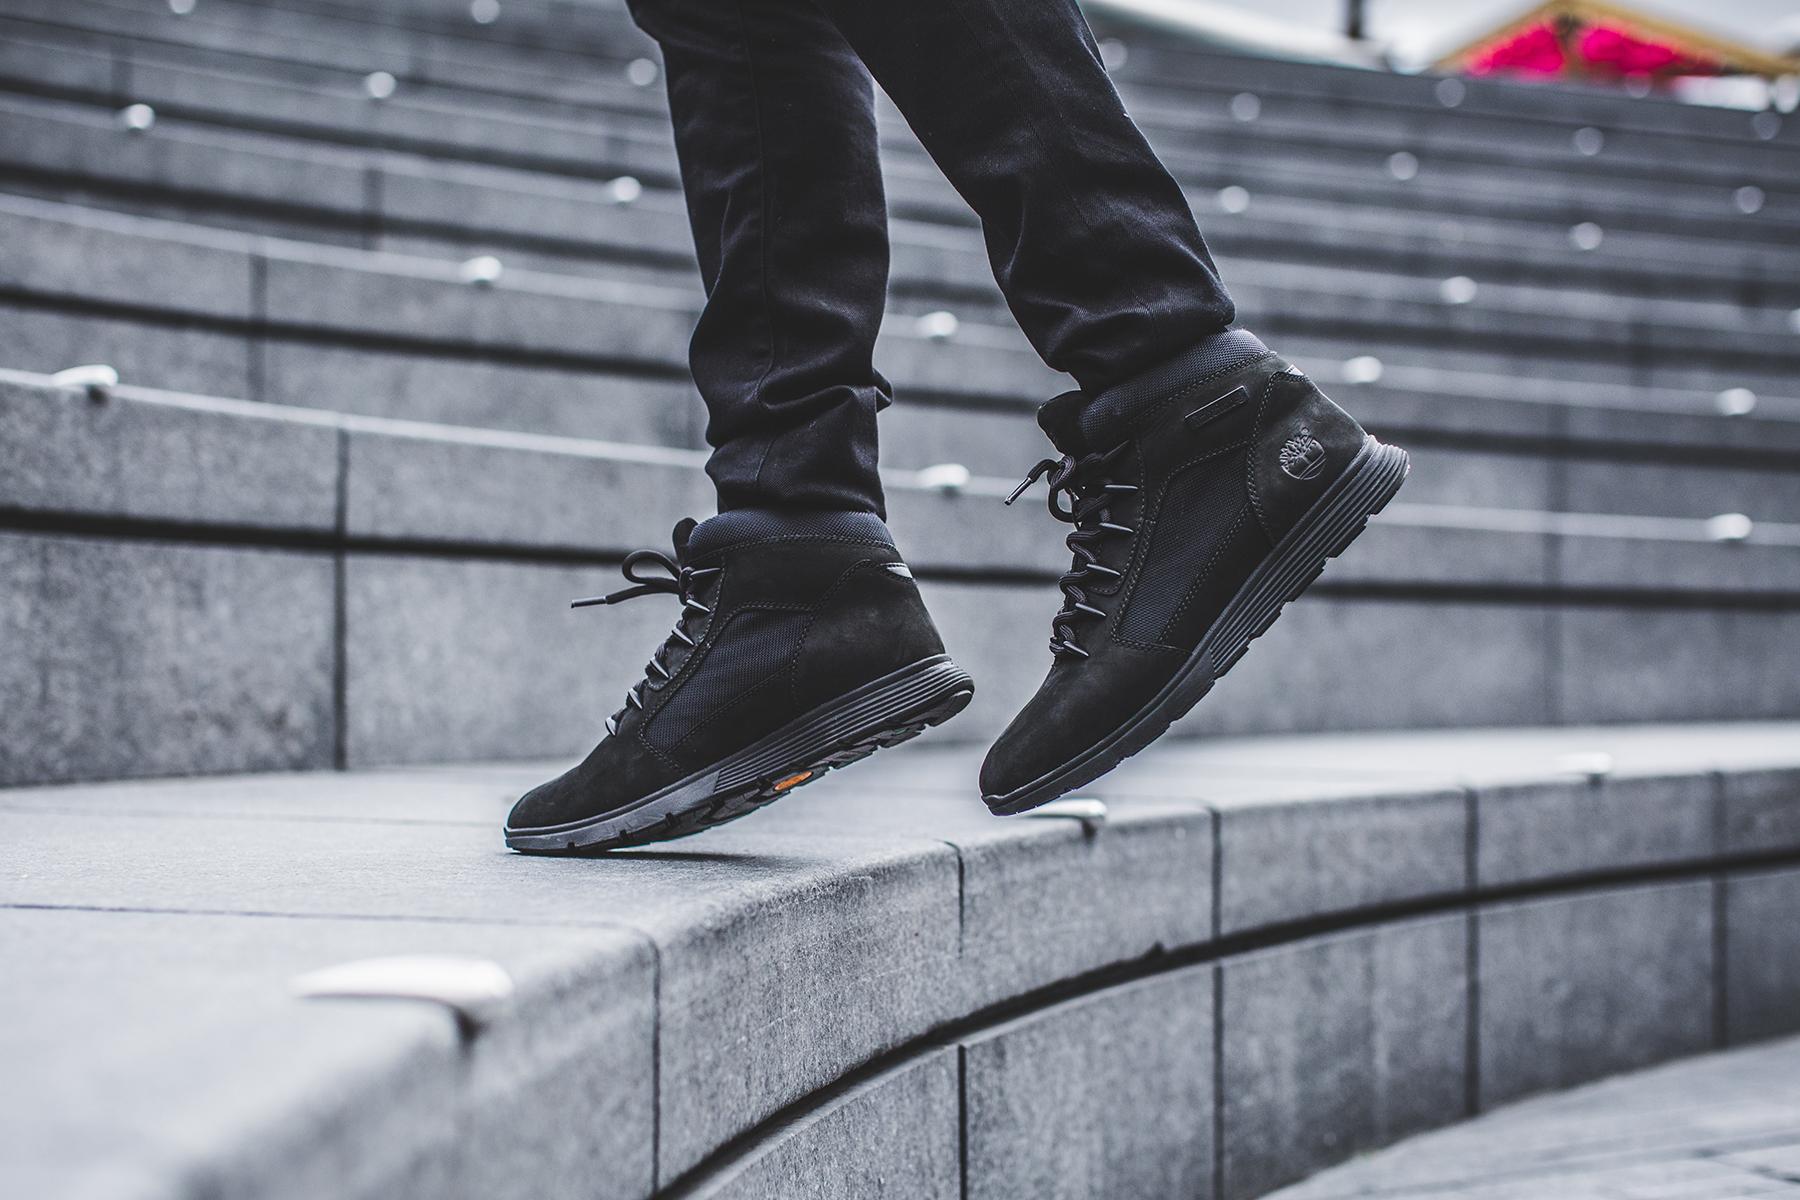 Timberland boot sneaker hybrid the killington hiker hypebeast